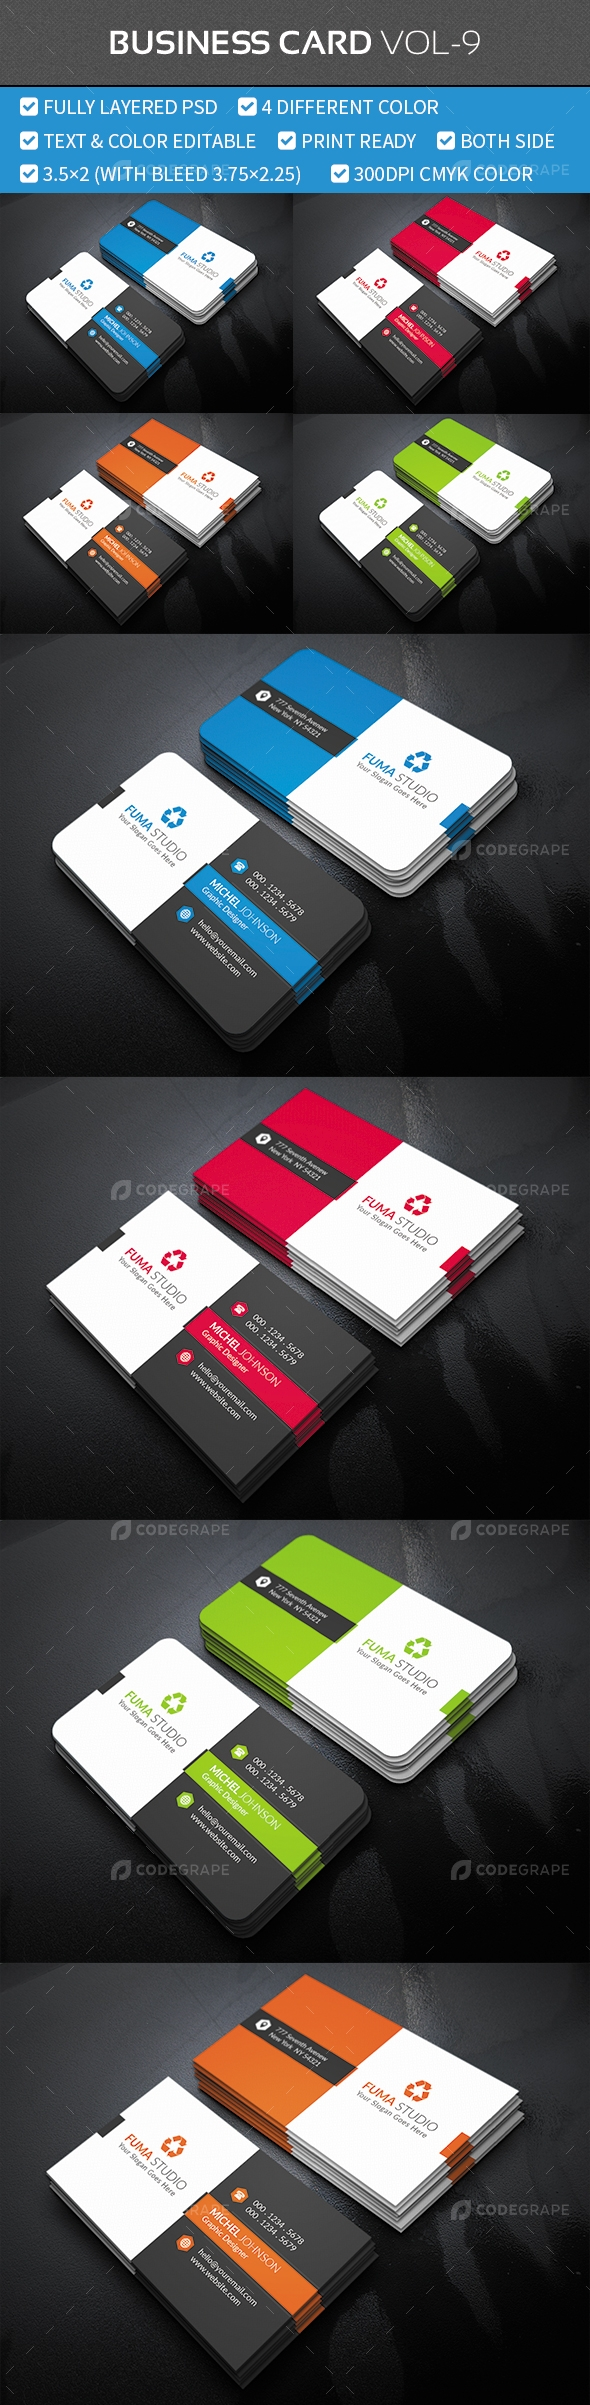 Business Card Vol-9